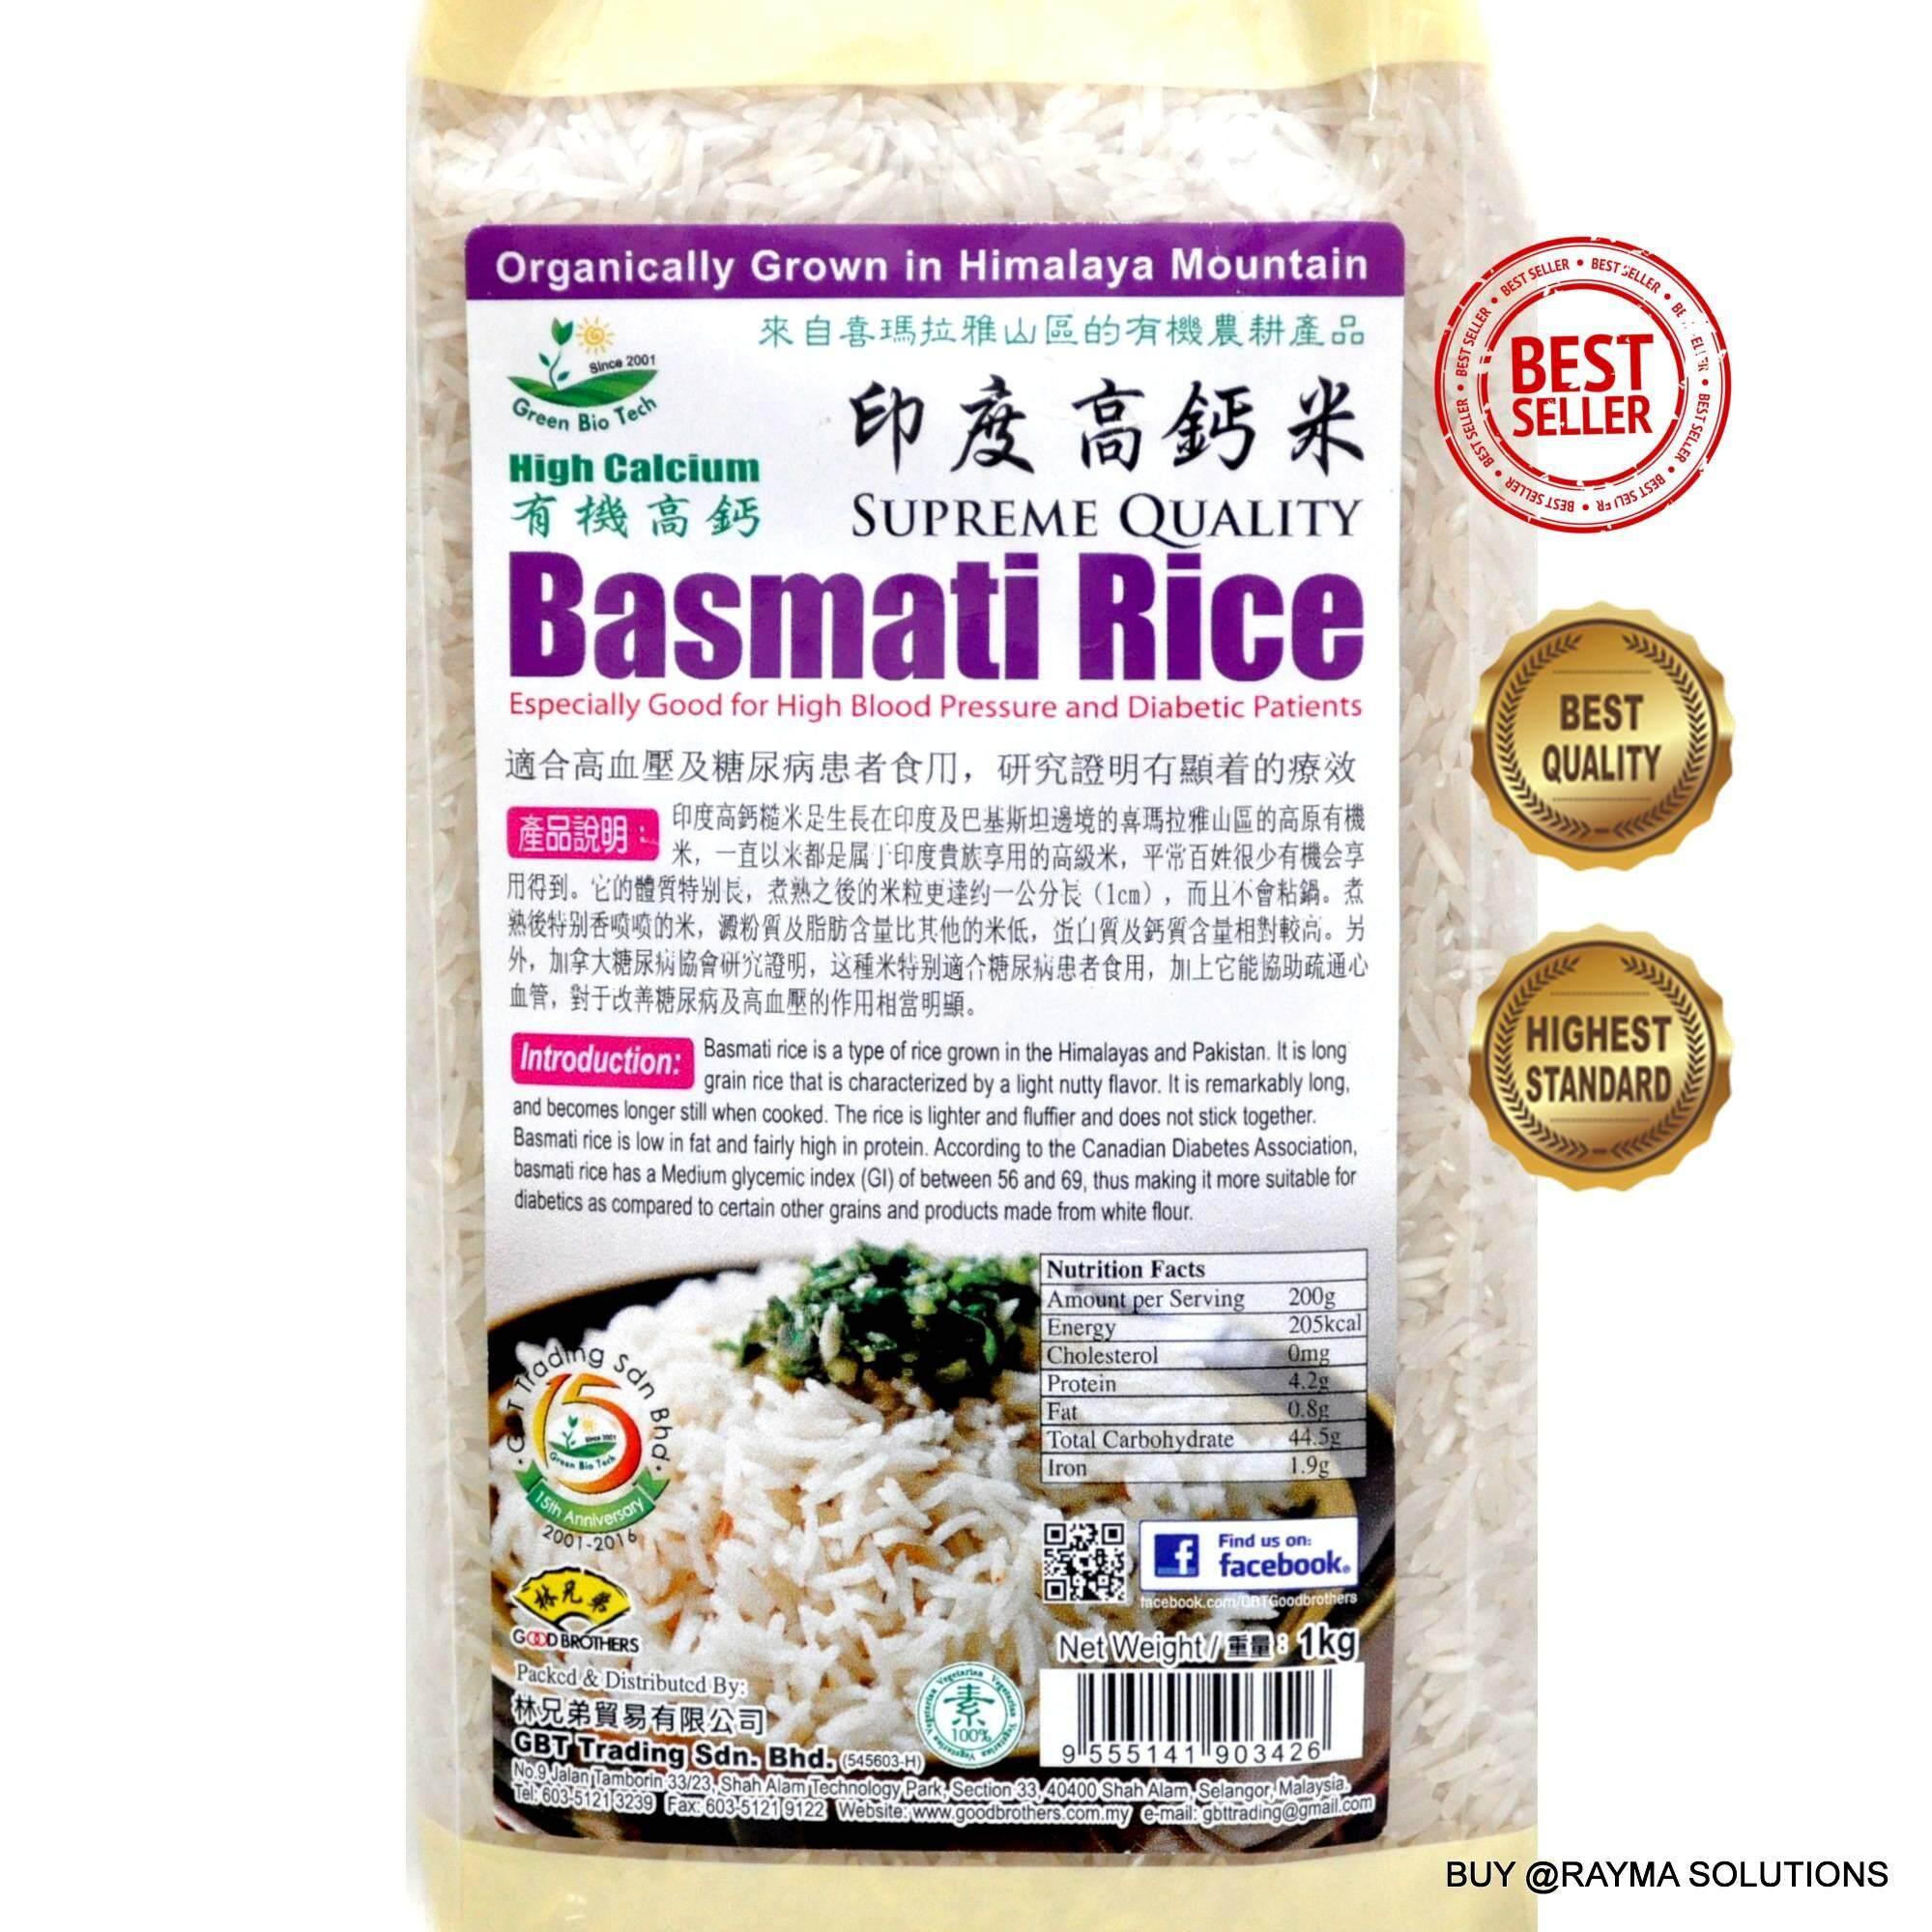 MH FOOD Organic Basmati Rice, Supreme Quality, 1kg